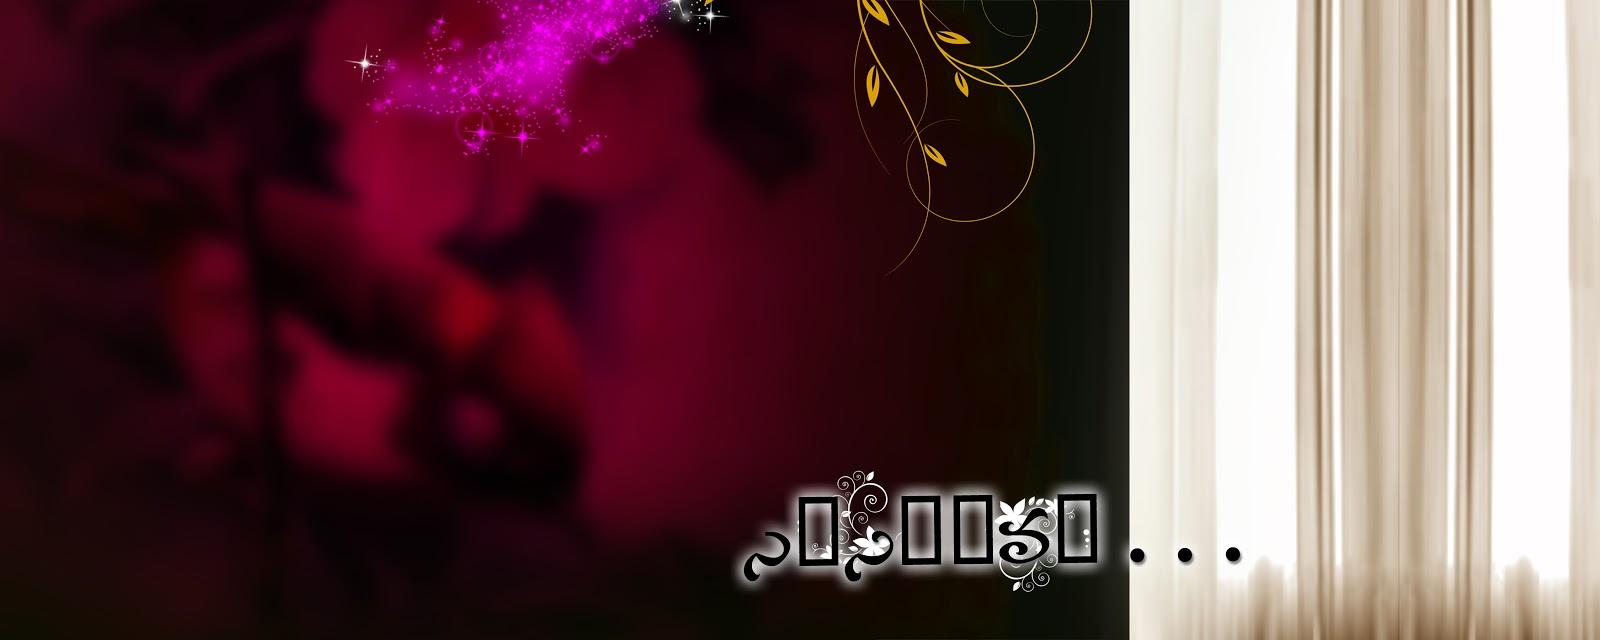 Photoshop Wedding Background Designs Psd Free Download